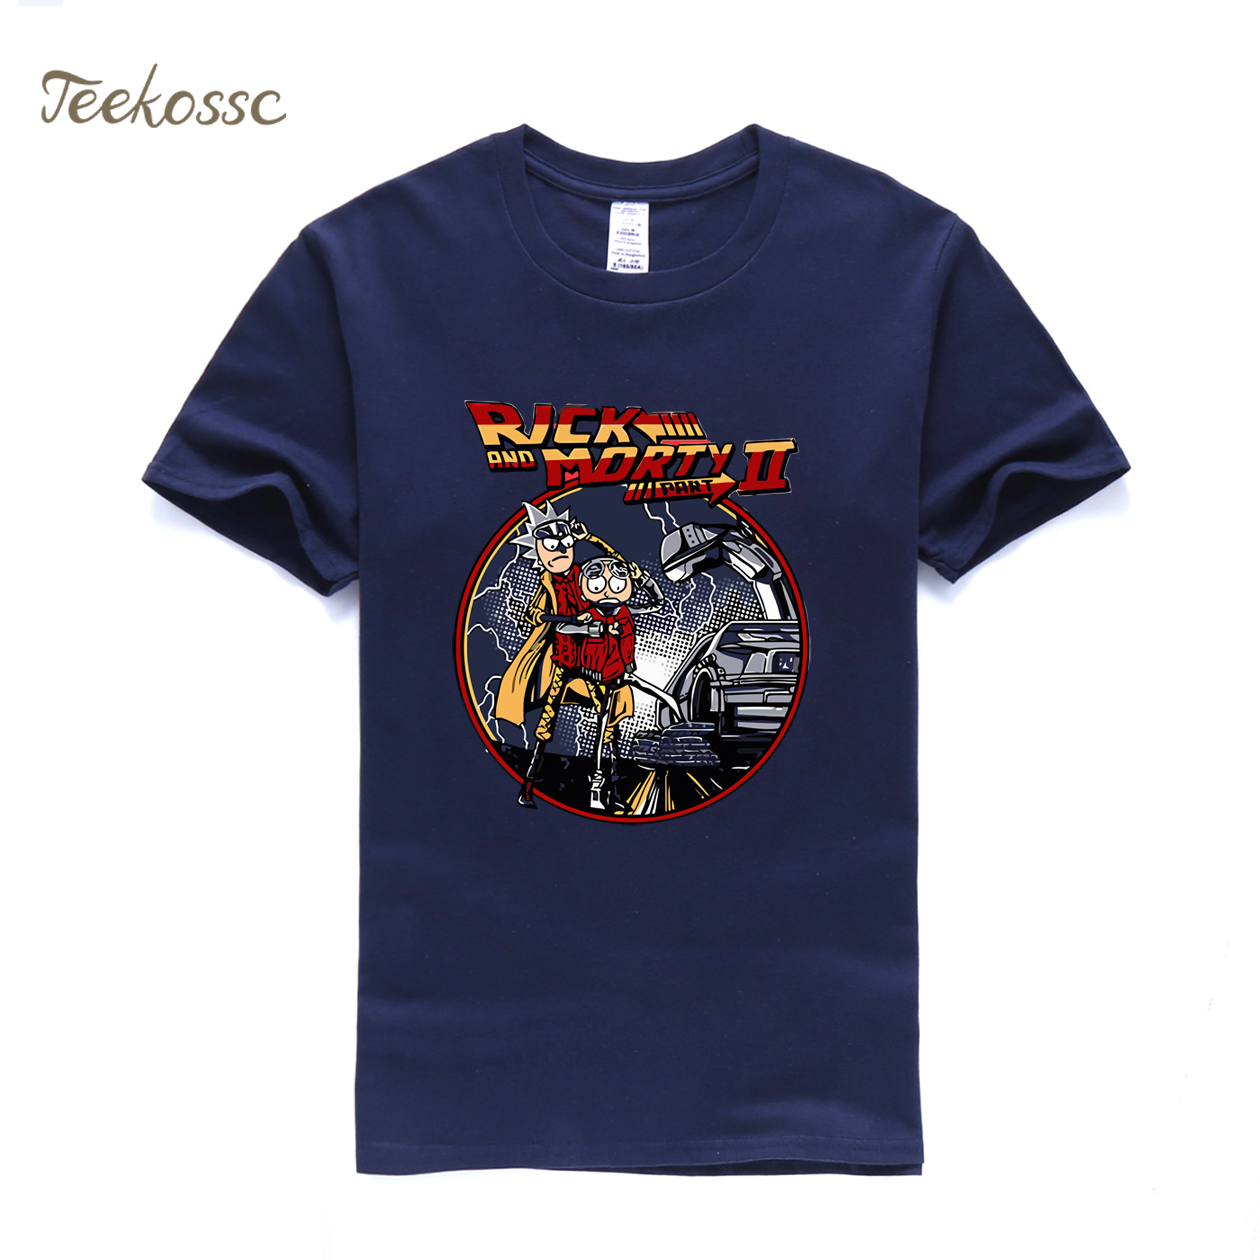 Rick and Morty T Shirt Men Back To The Future Tshirt Mens 2018 Summer Tops Tee Funny Shirts Swag T-Shirt Anime Hip Hop Streewear